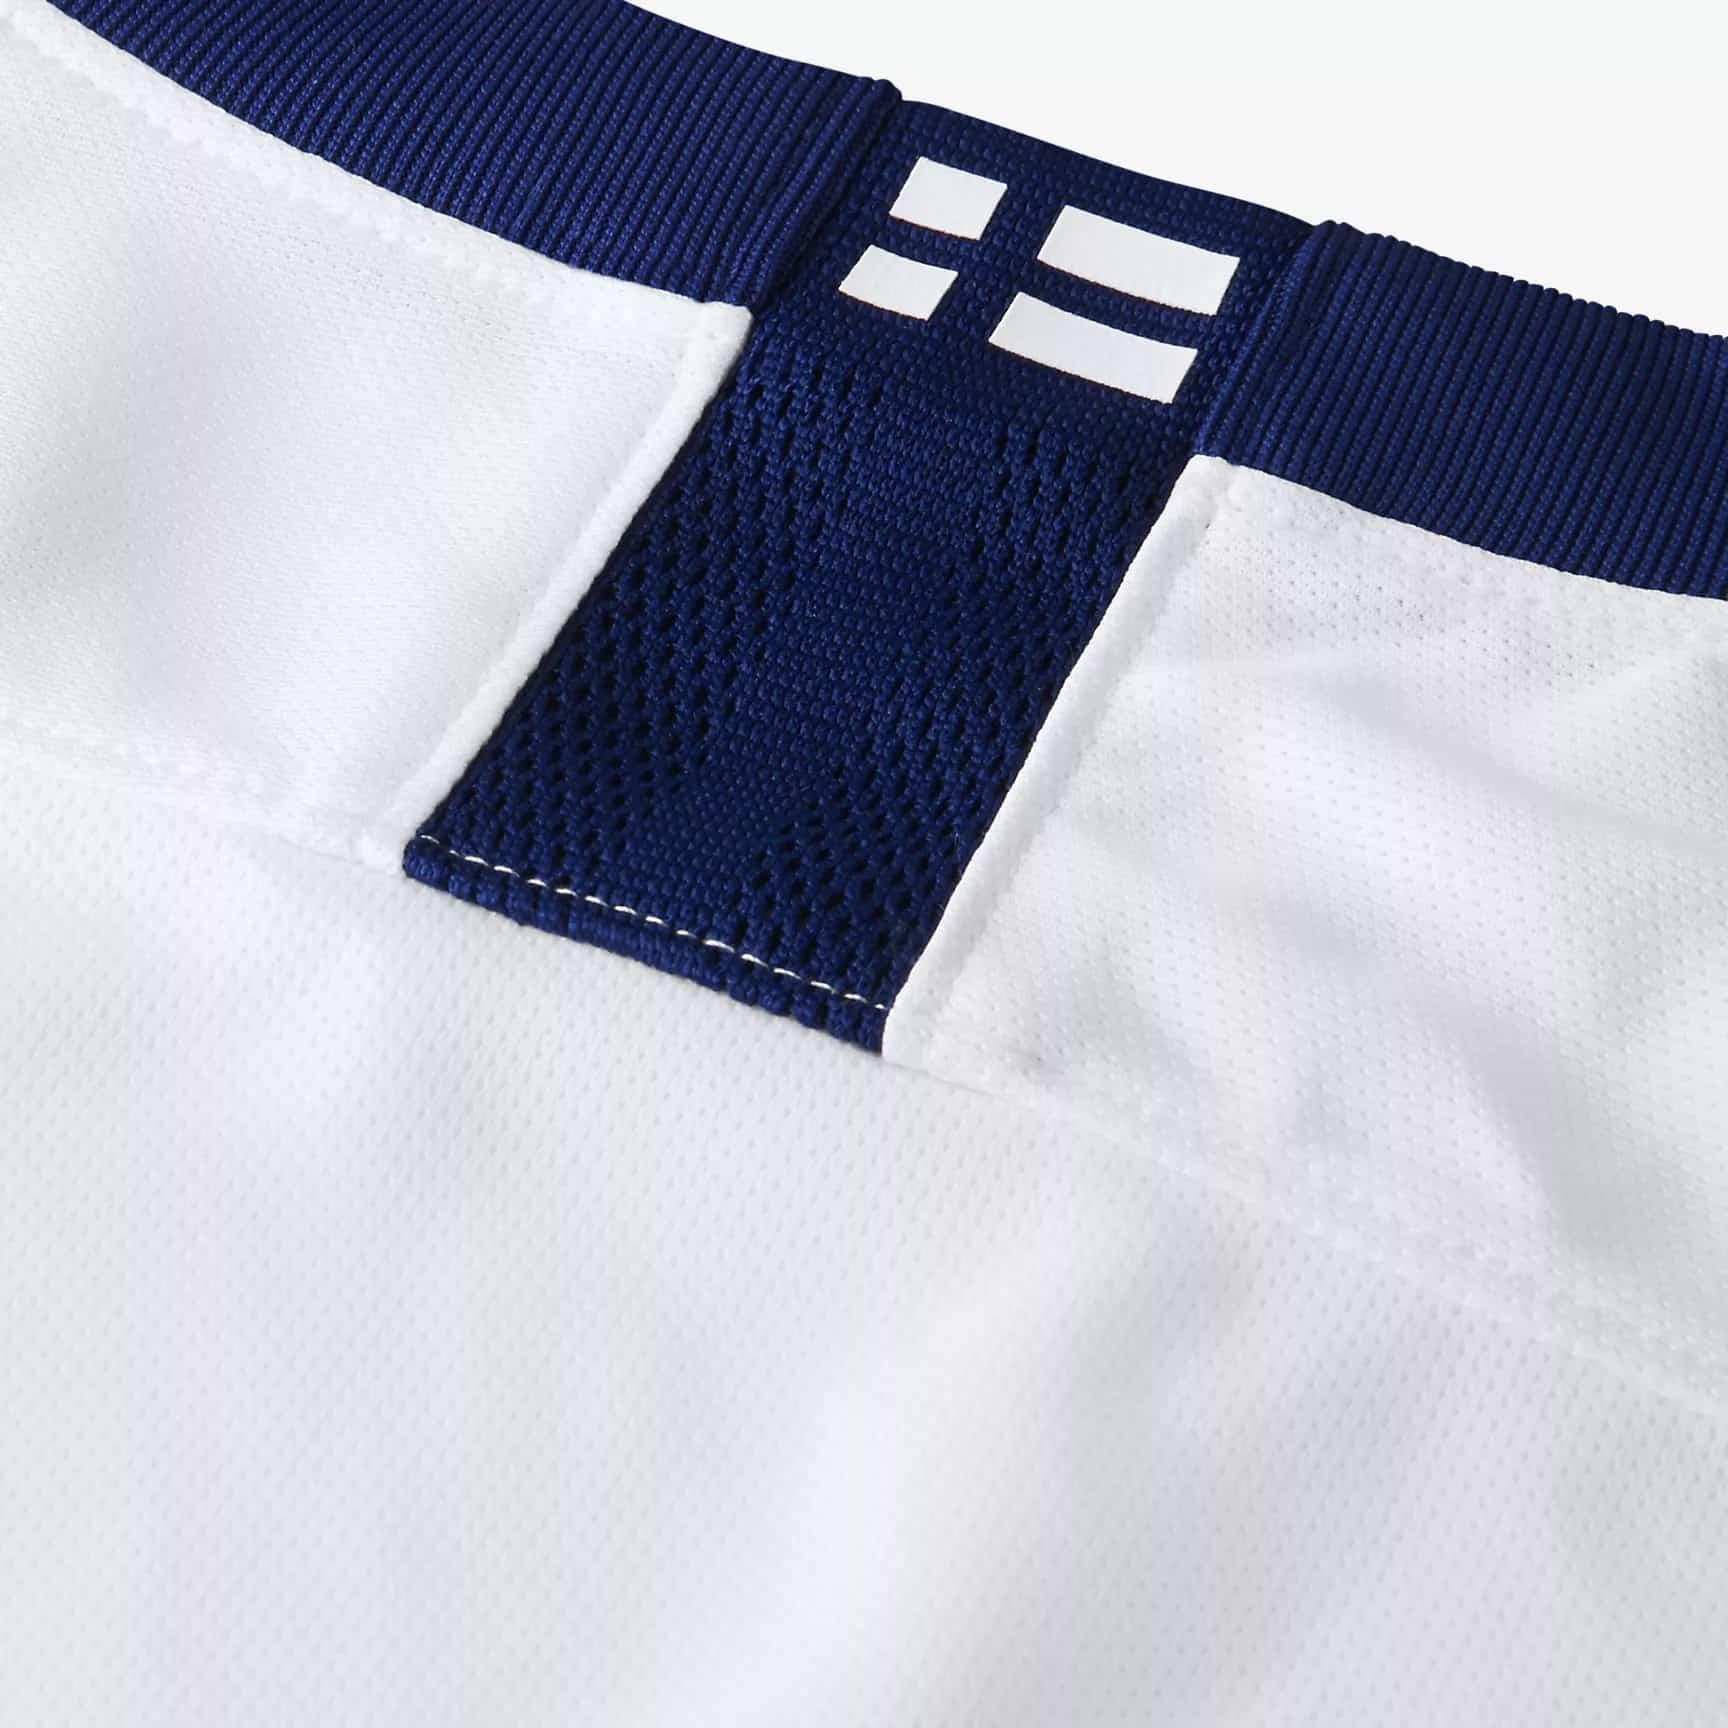 maillot-finlande-nike-7